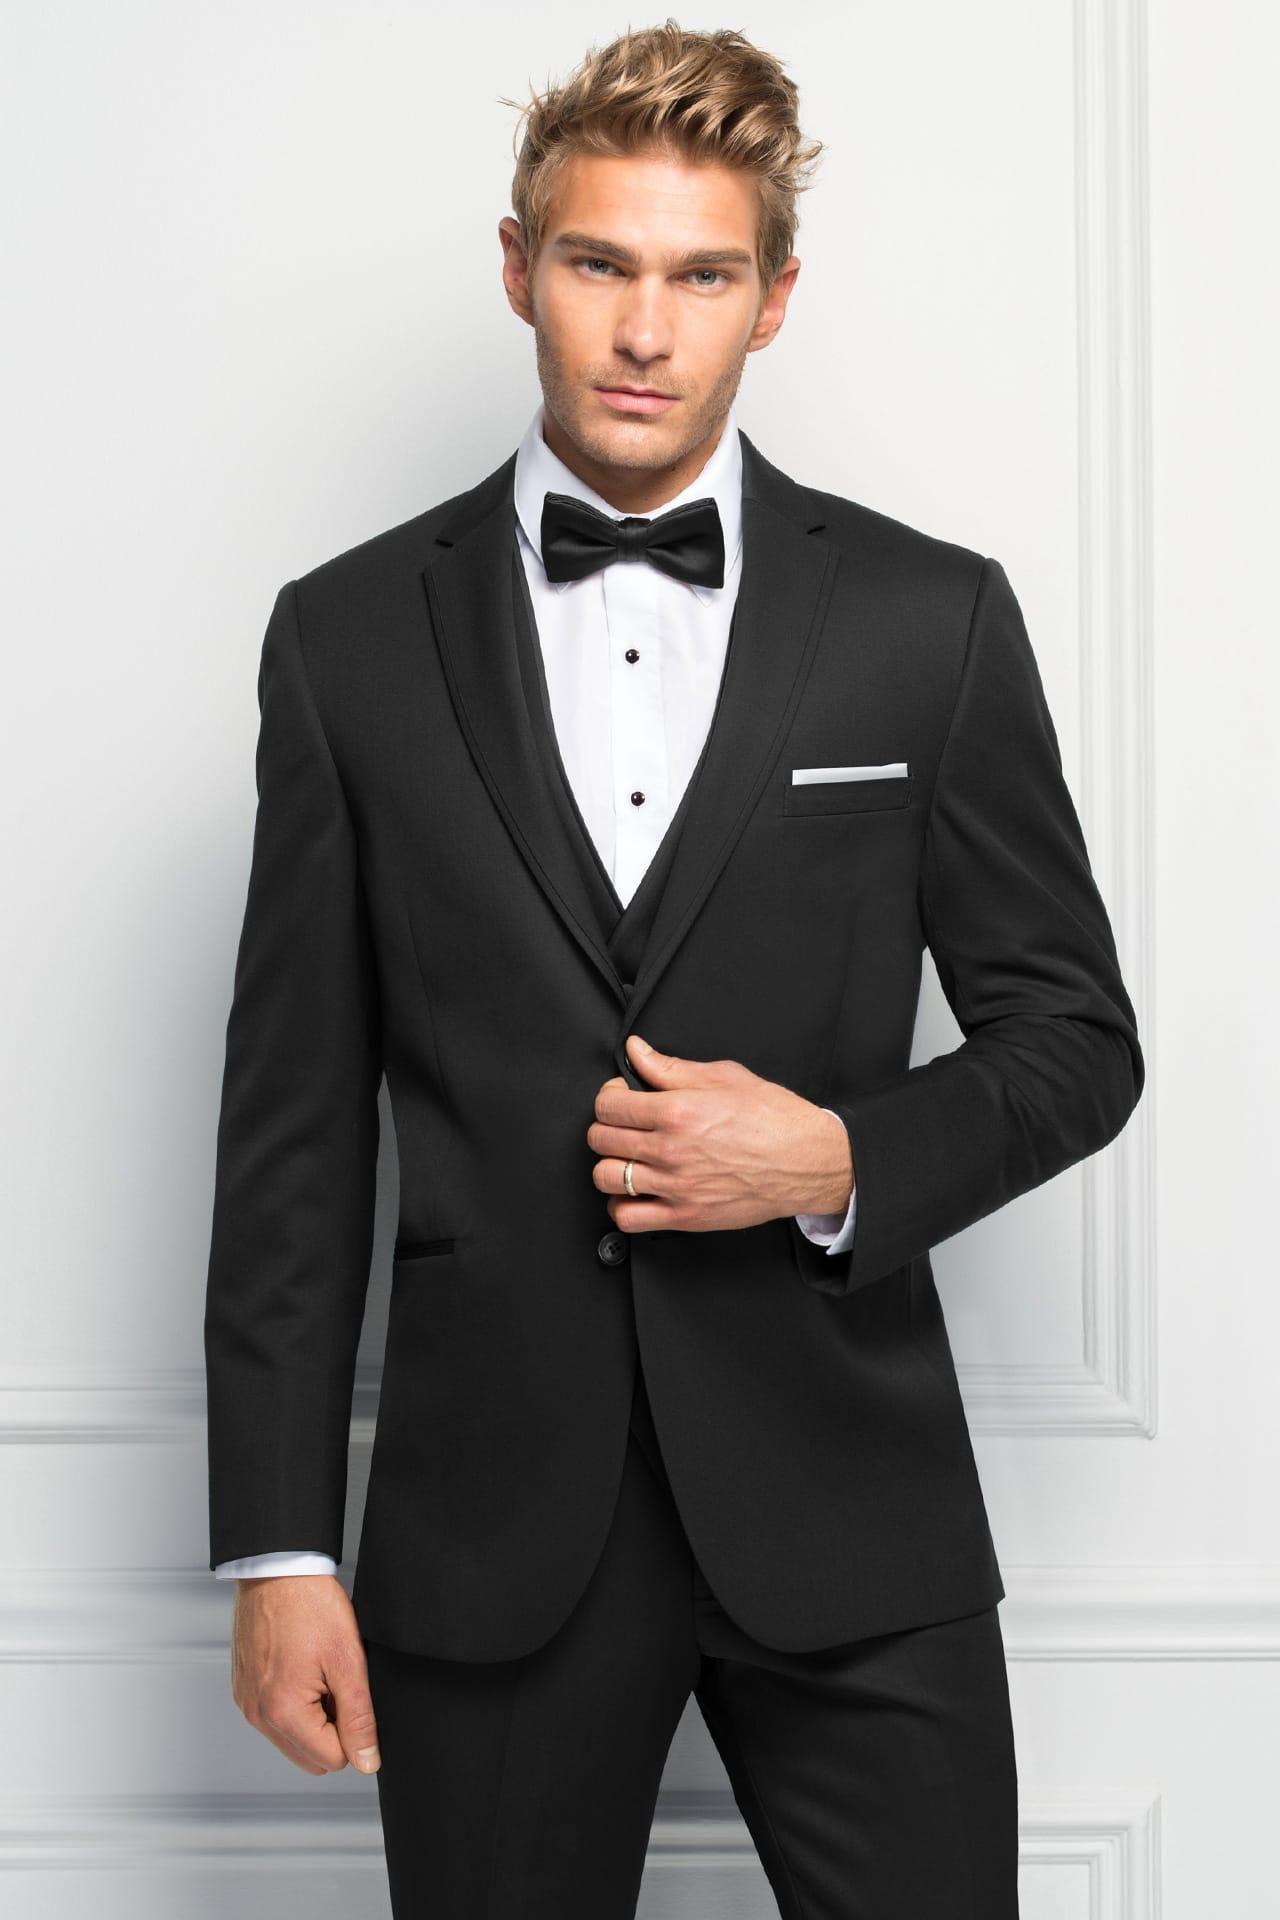 Michael Kors Ultra Slim Sterling Wedding Suit Ultra Slim Fit Suit | Jim's  Formal Wear